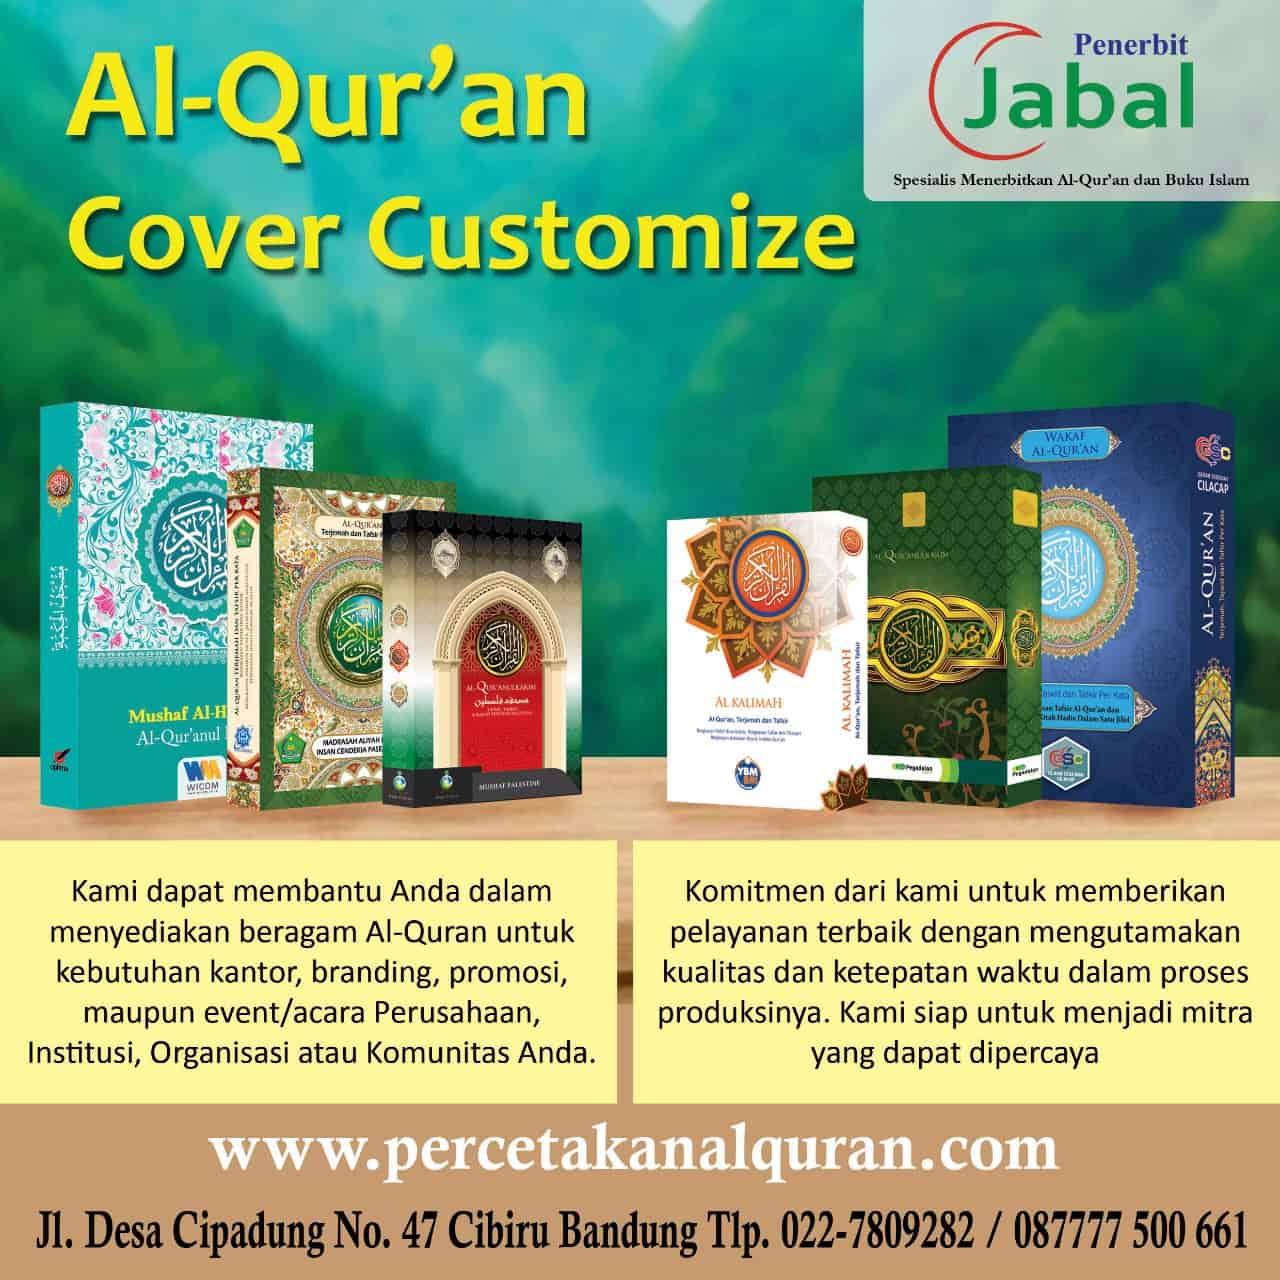 Penerbit Alquran, Percetakan Alquran, Penerbit Jabal